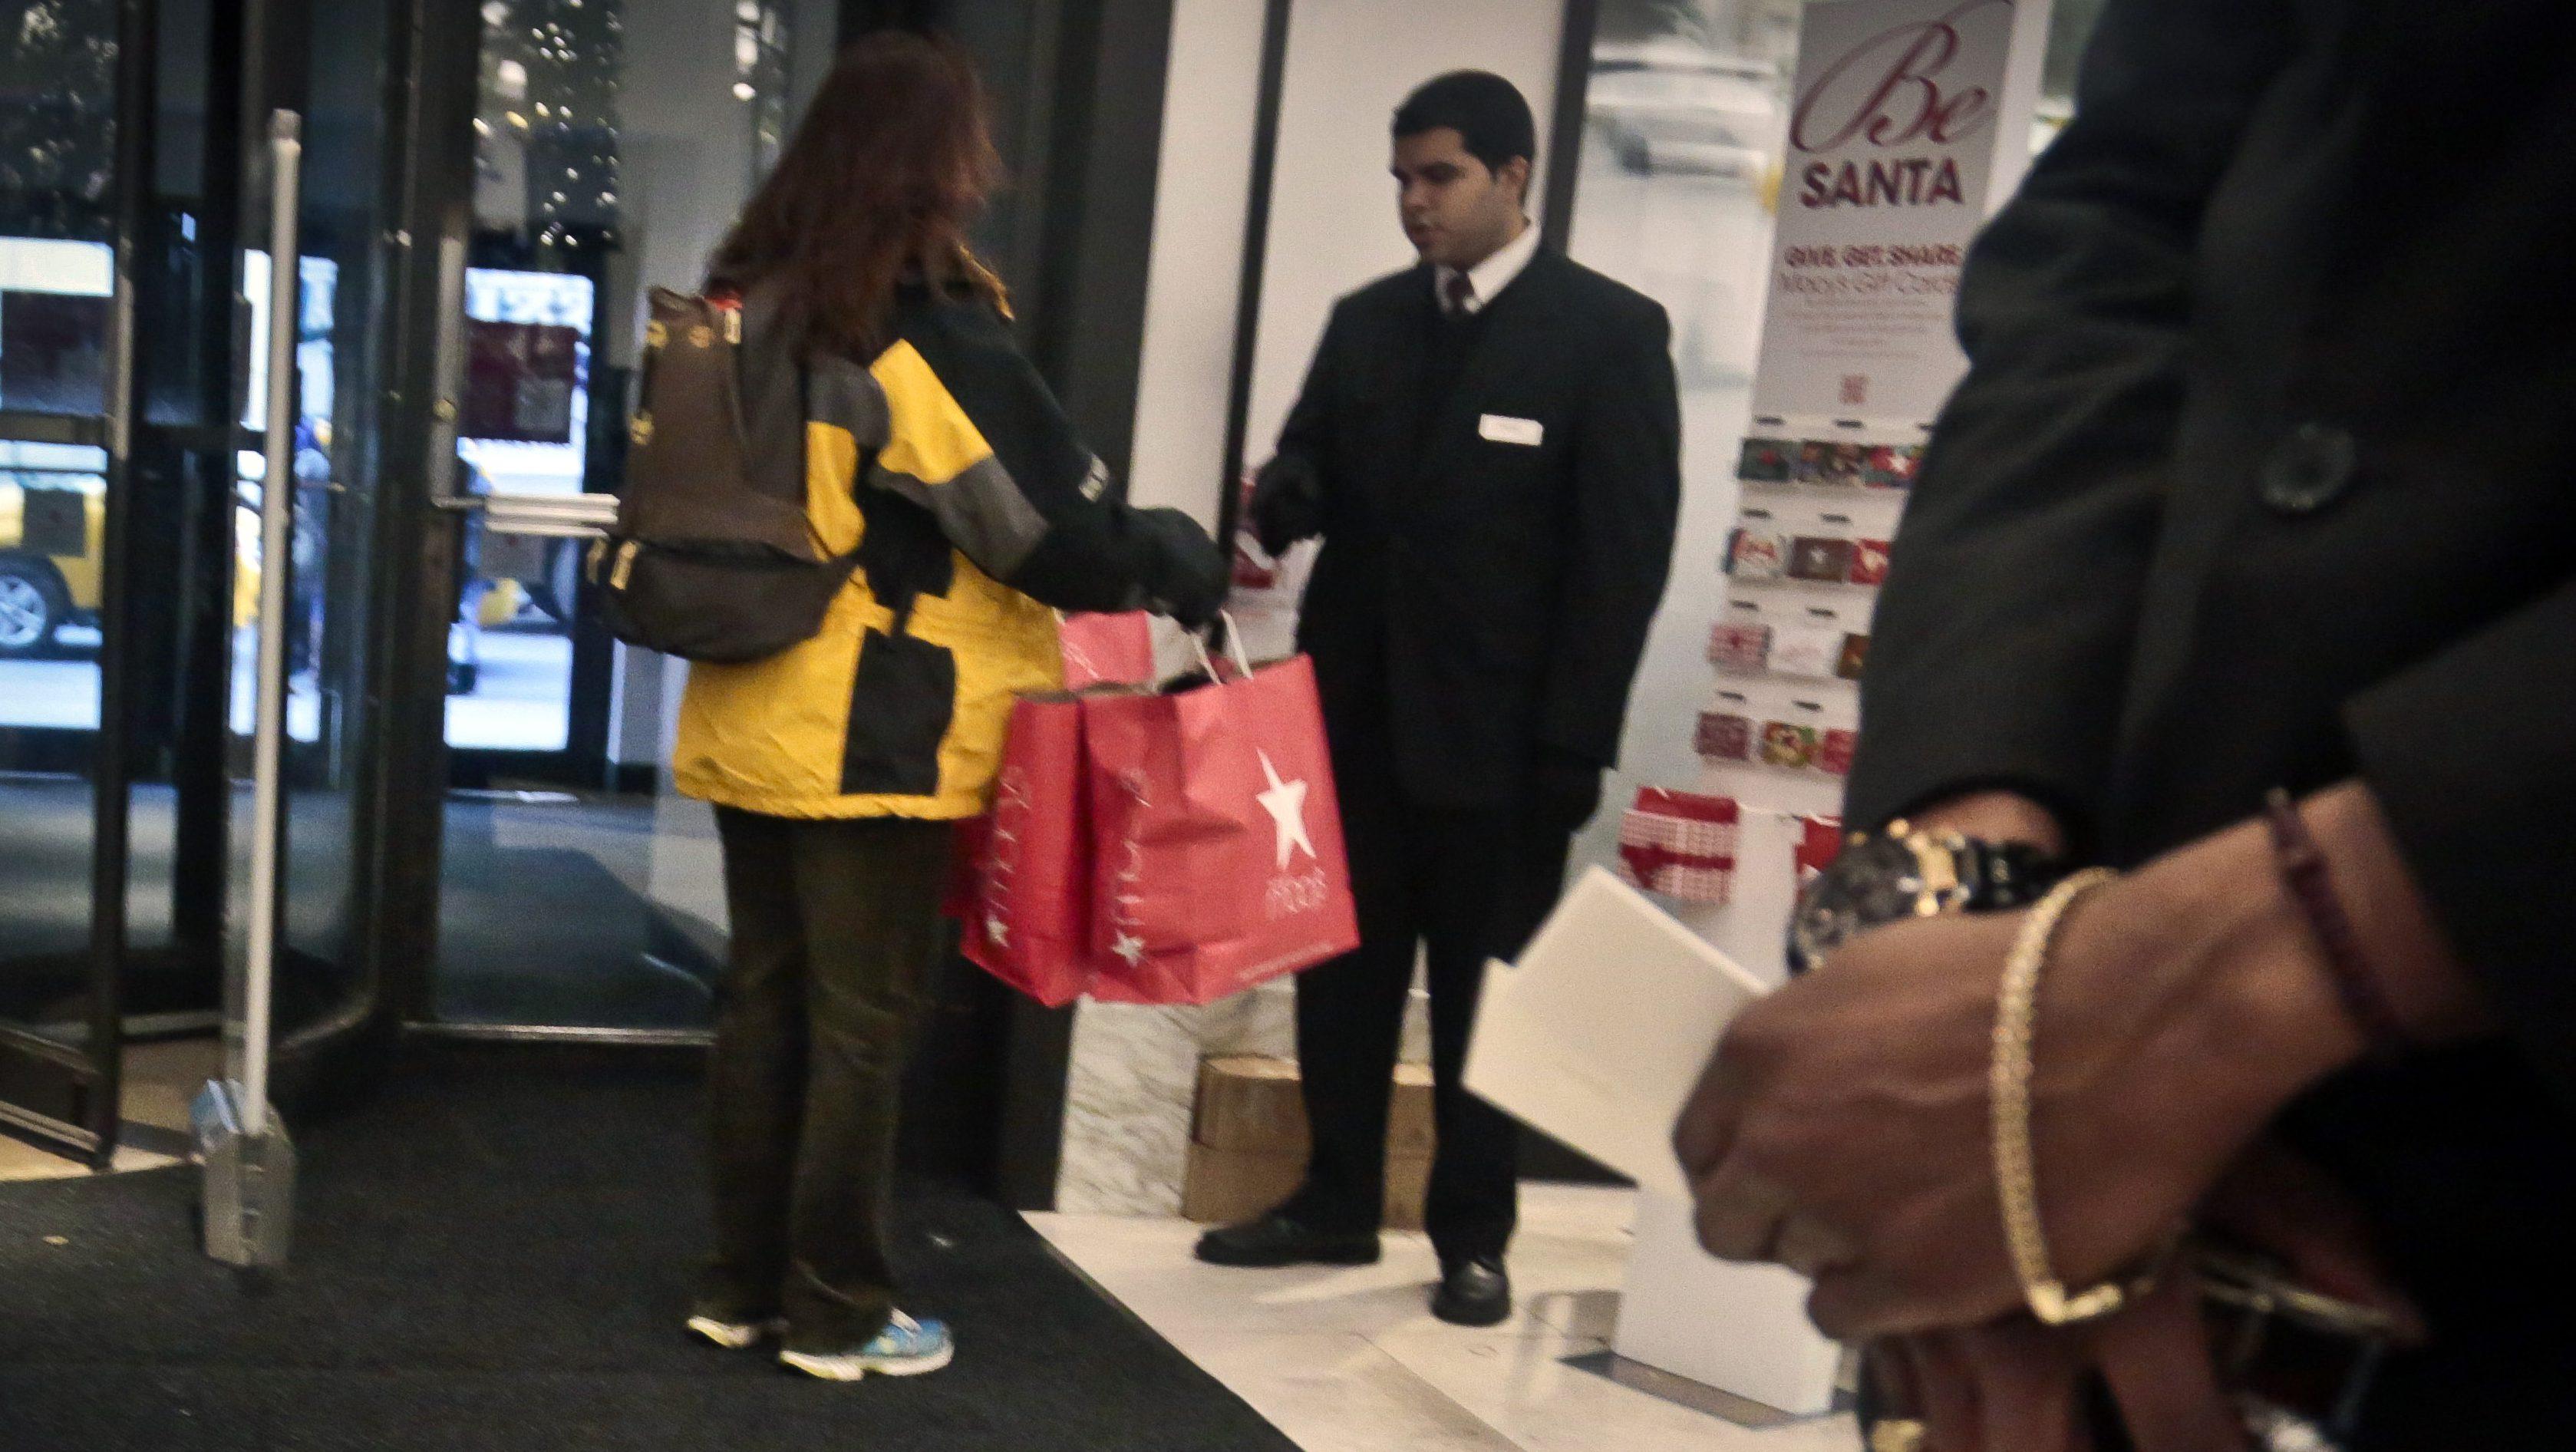 Restorative justice: Big retailers' solution to shoplifting